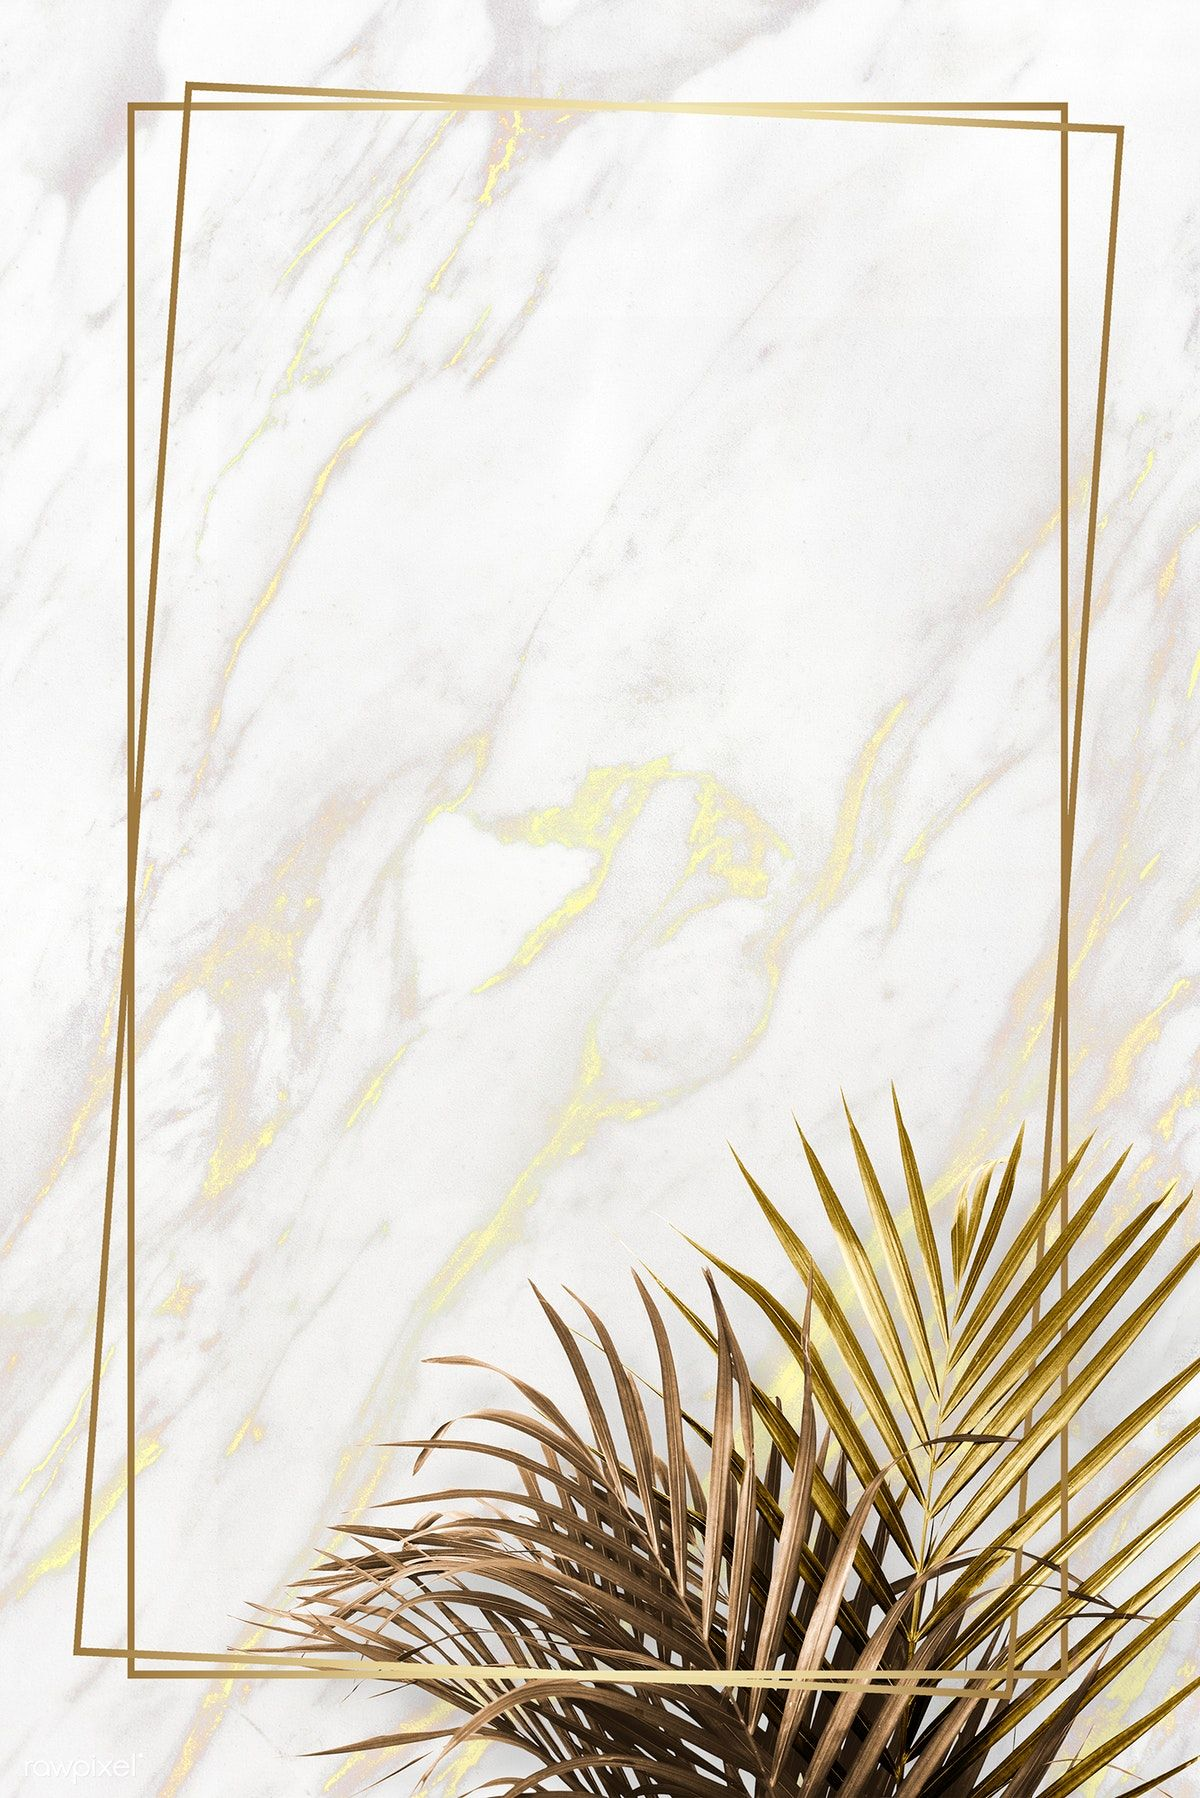 Rectangle Golden Frame On A Marble Background Premium Image By Rawpixel Com Adj Hwang Framed Wallpaper Marble Wallpaper Phone Flower Background Wallpaper Aesthetic background wallpaper golden